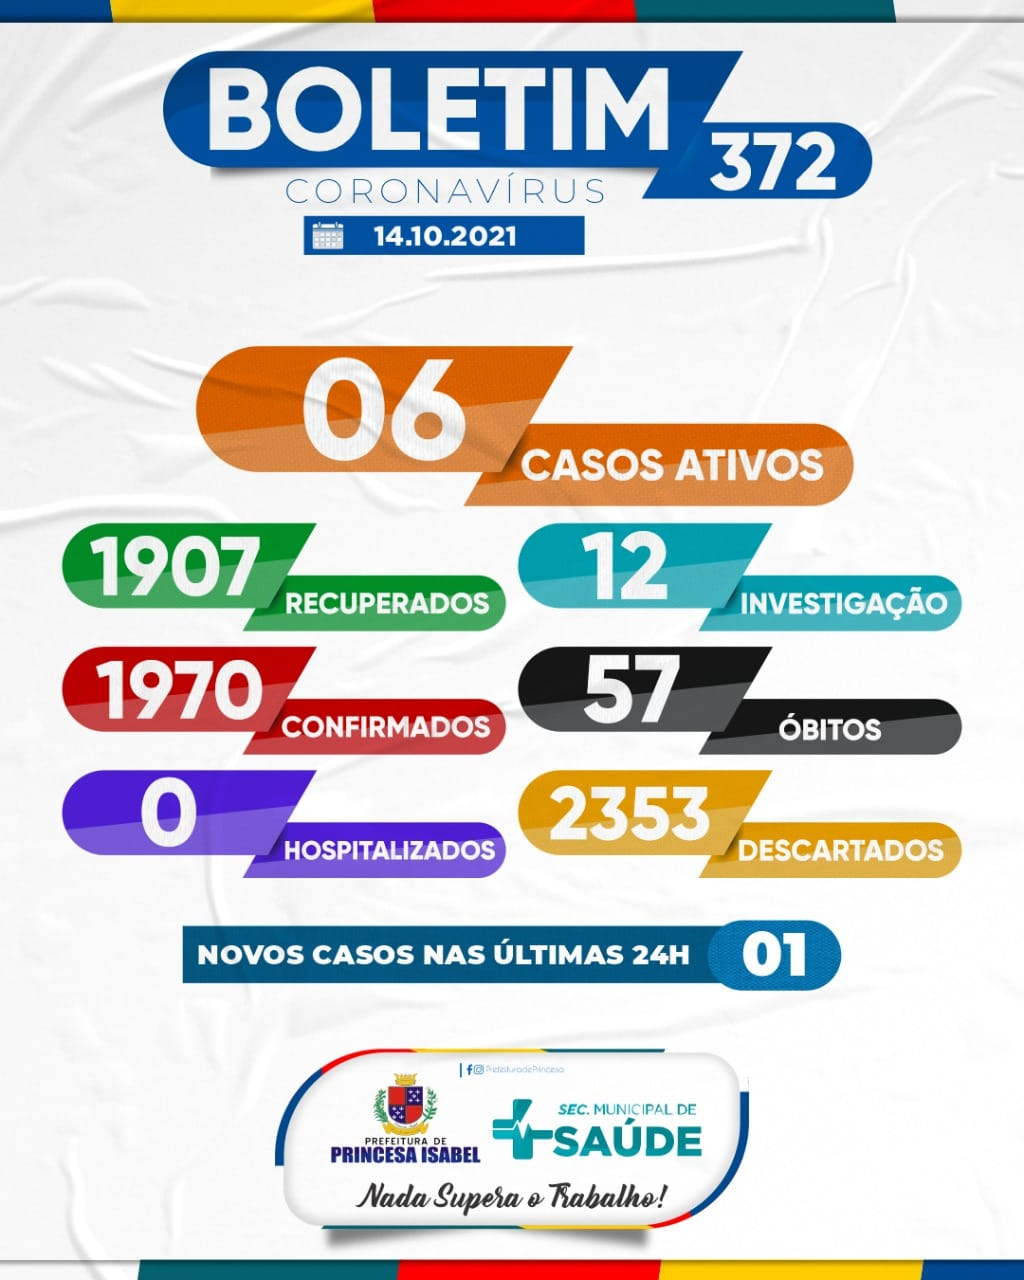 BOLETIM 372 - 14/10/2021